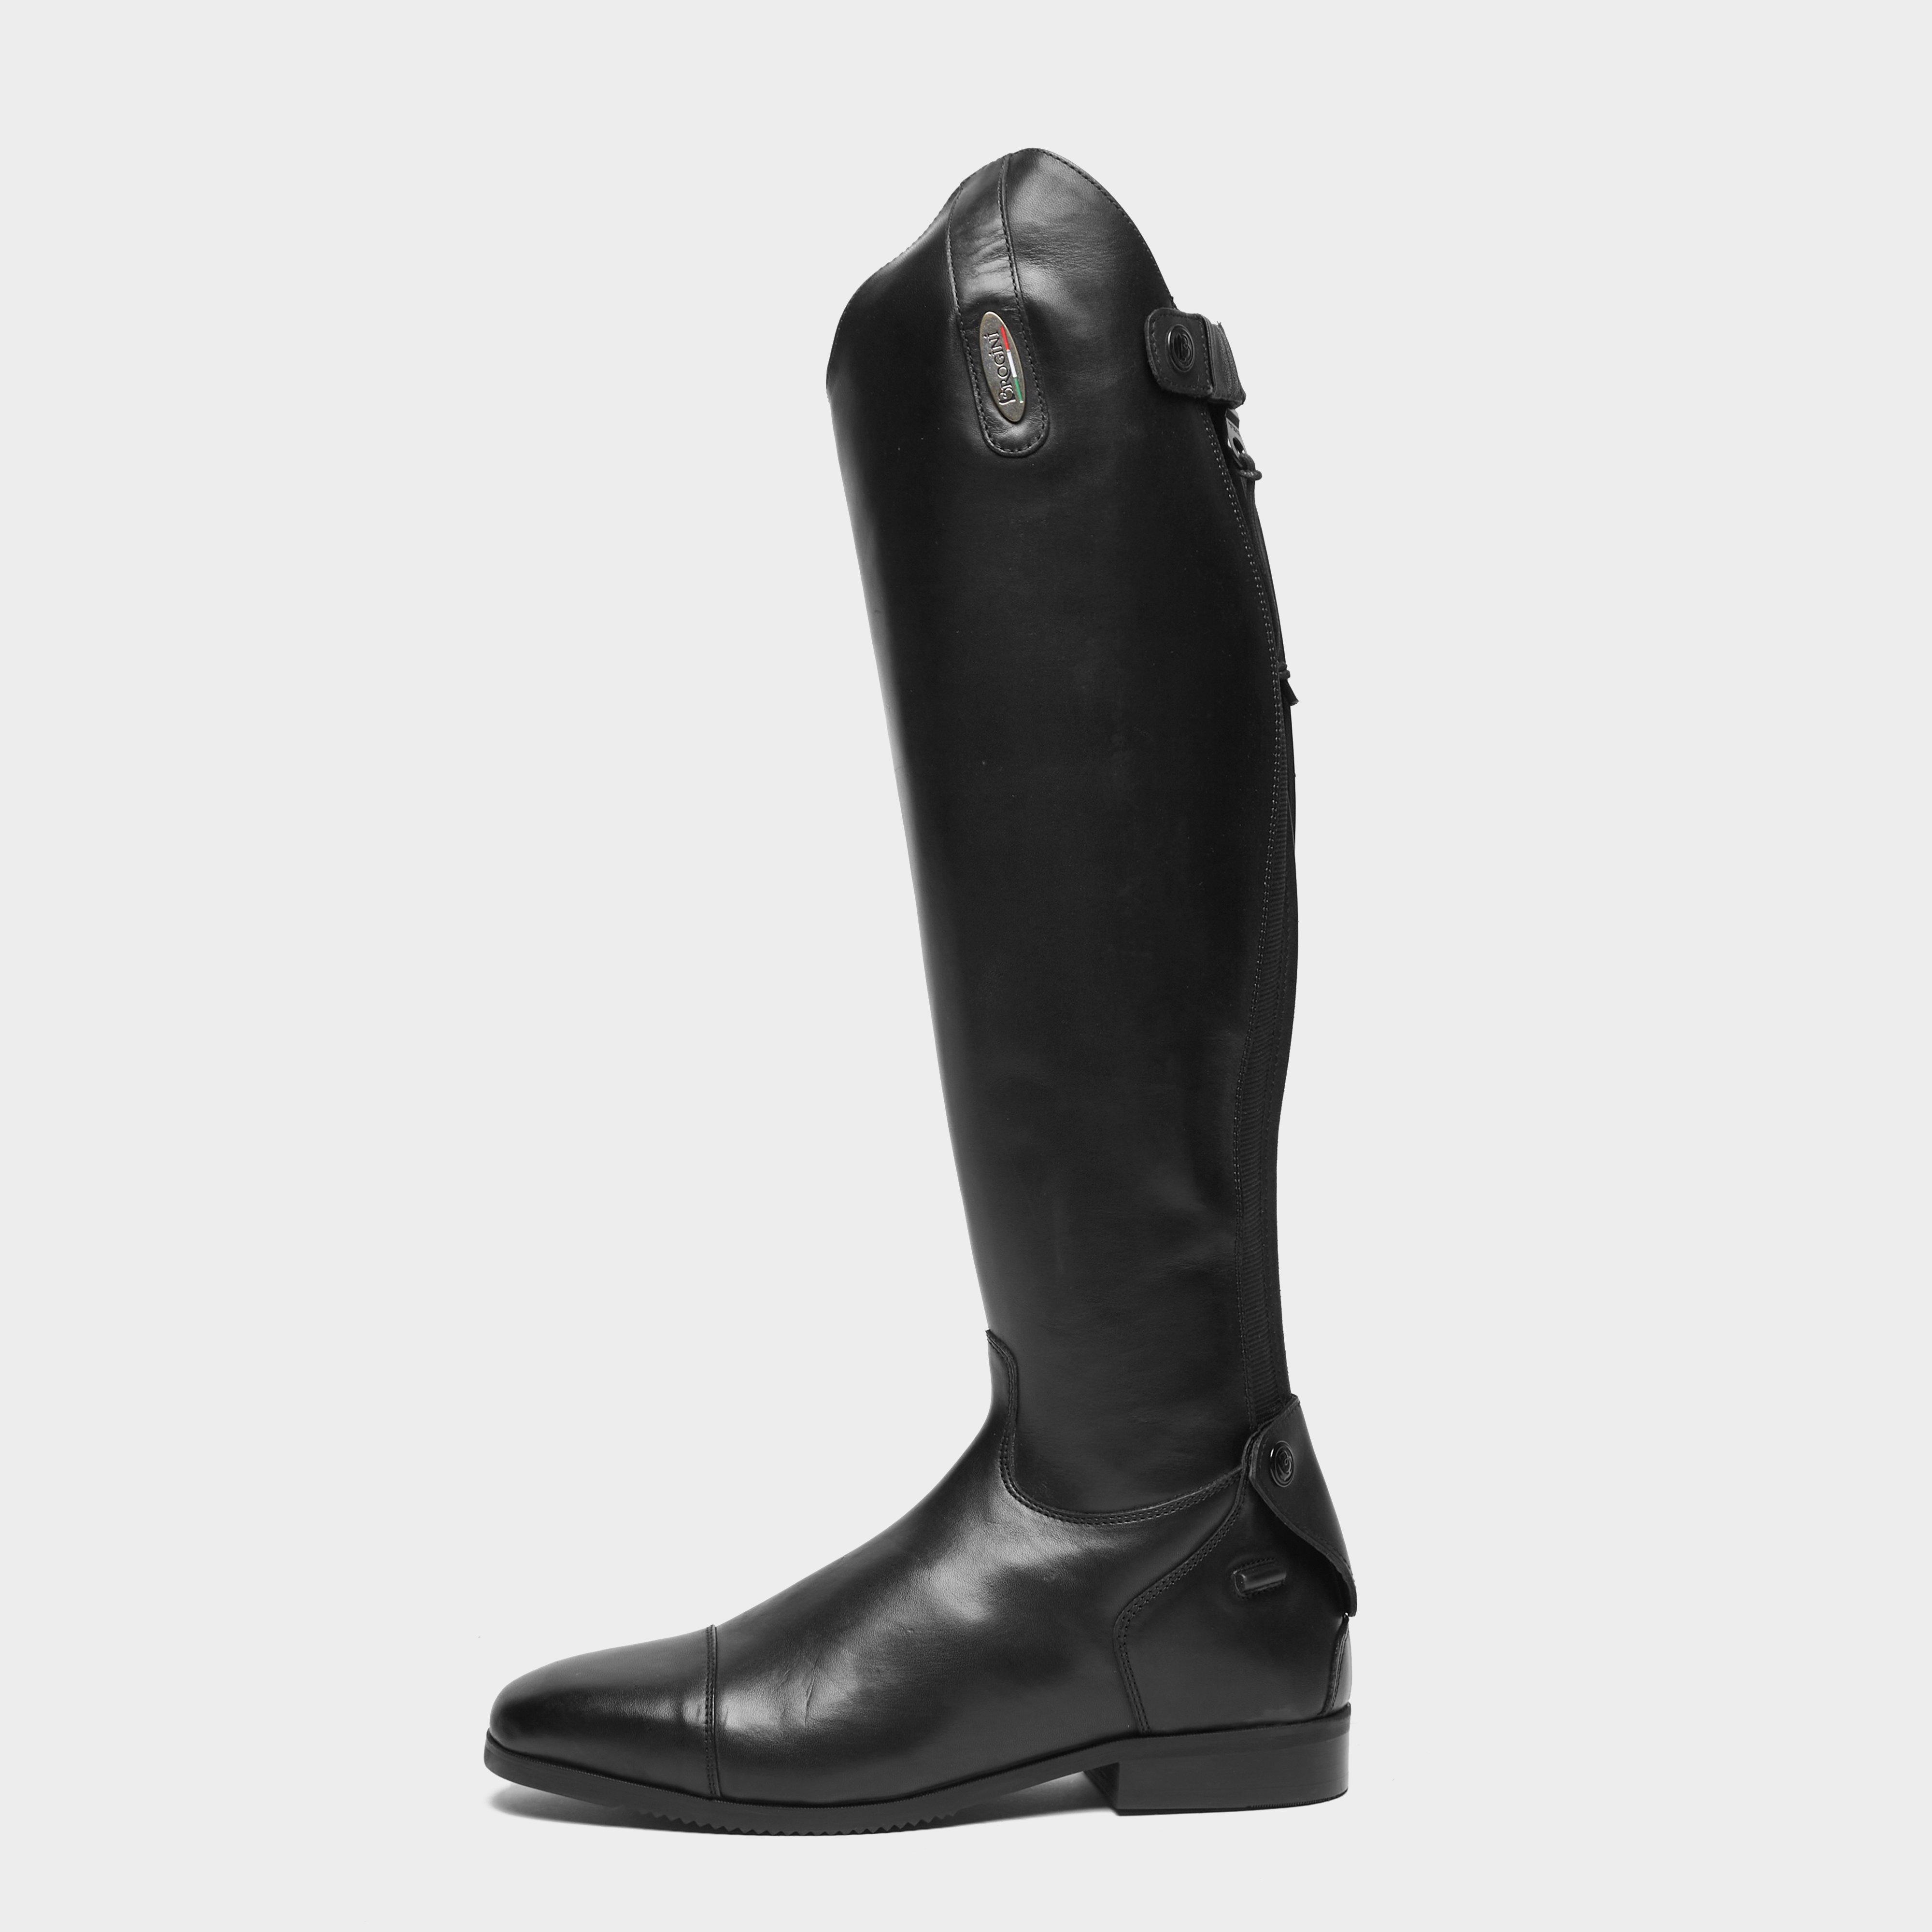 Brogini Women's Ostuni V2 Riding Boots - Black, Black